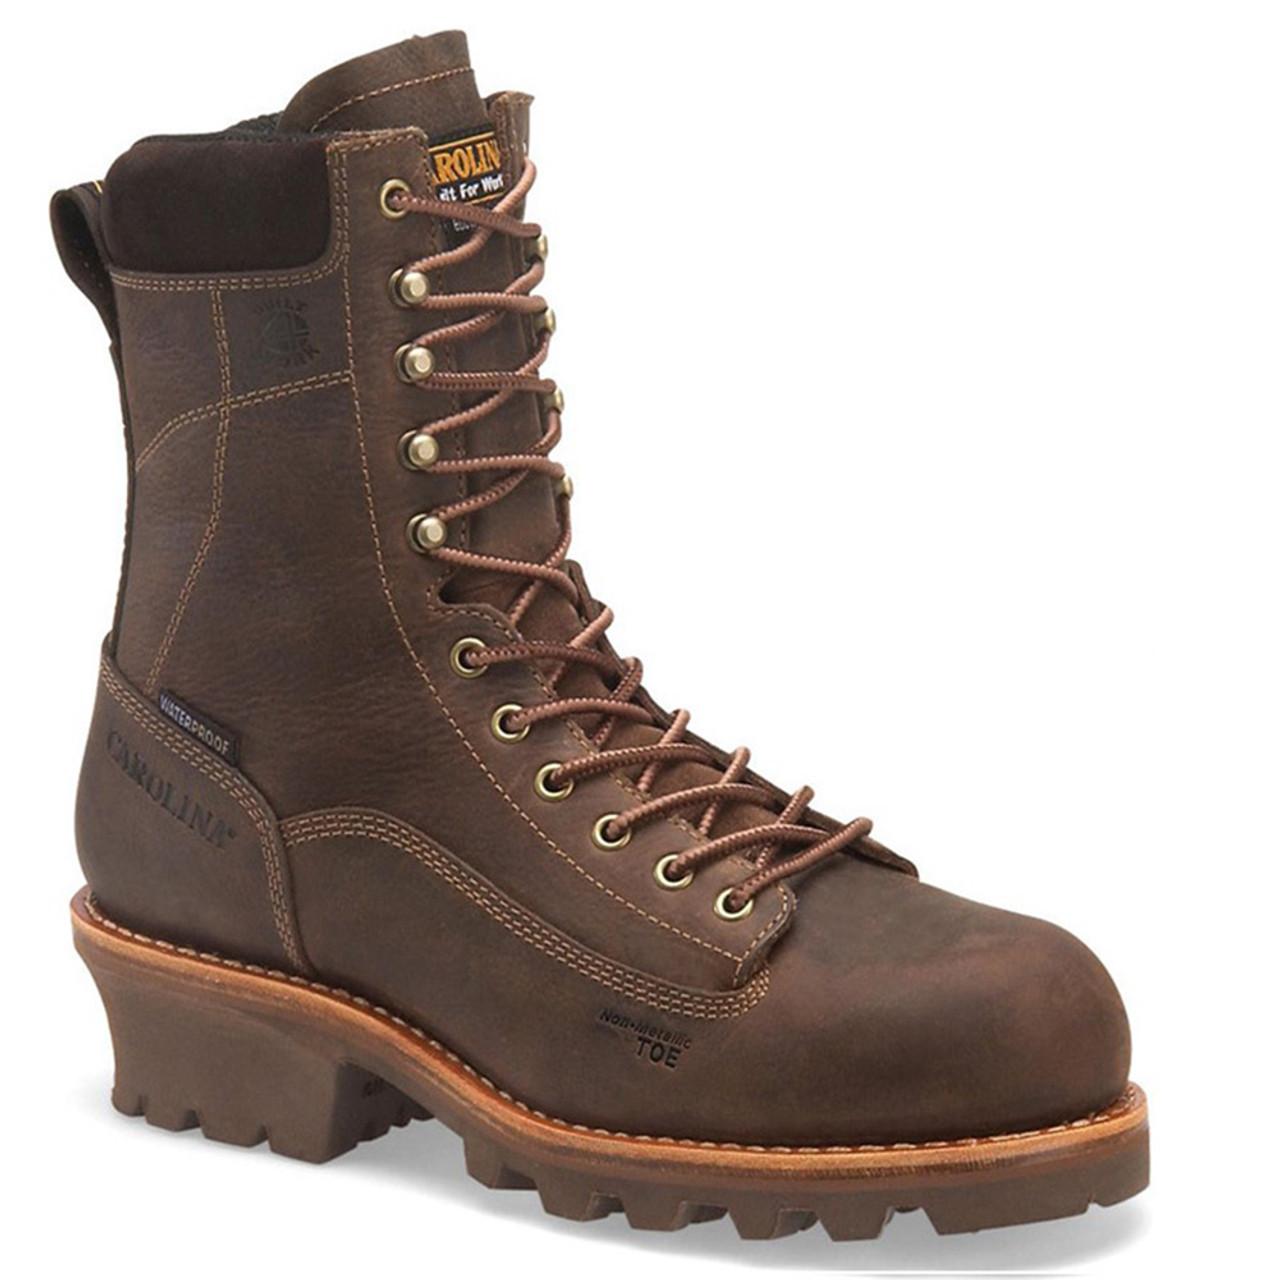 Carolina Ca7521 Composite Toe Logger Boots